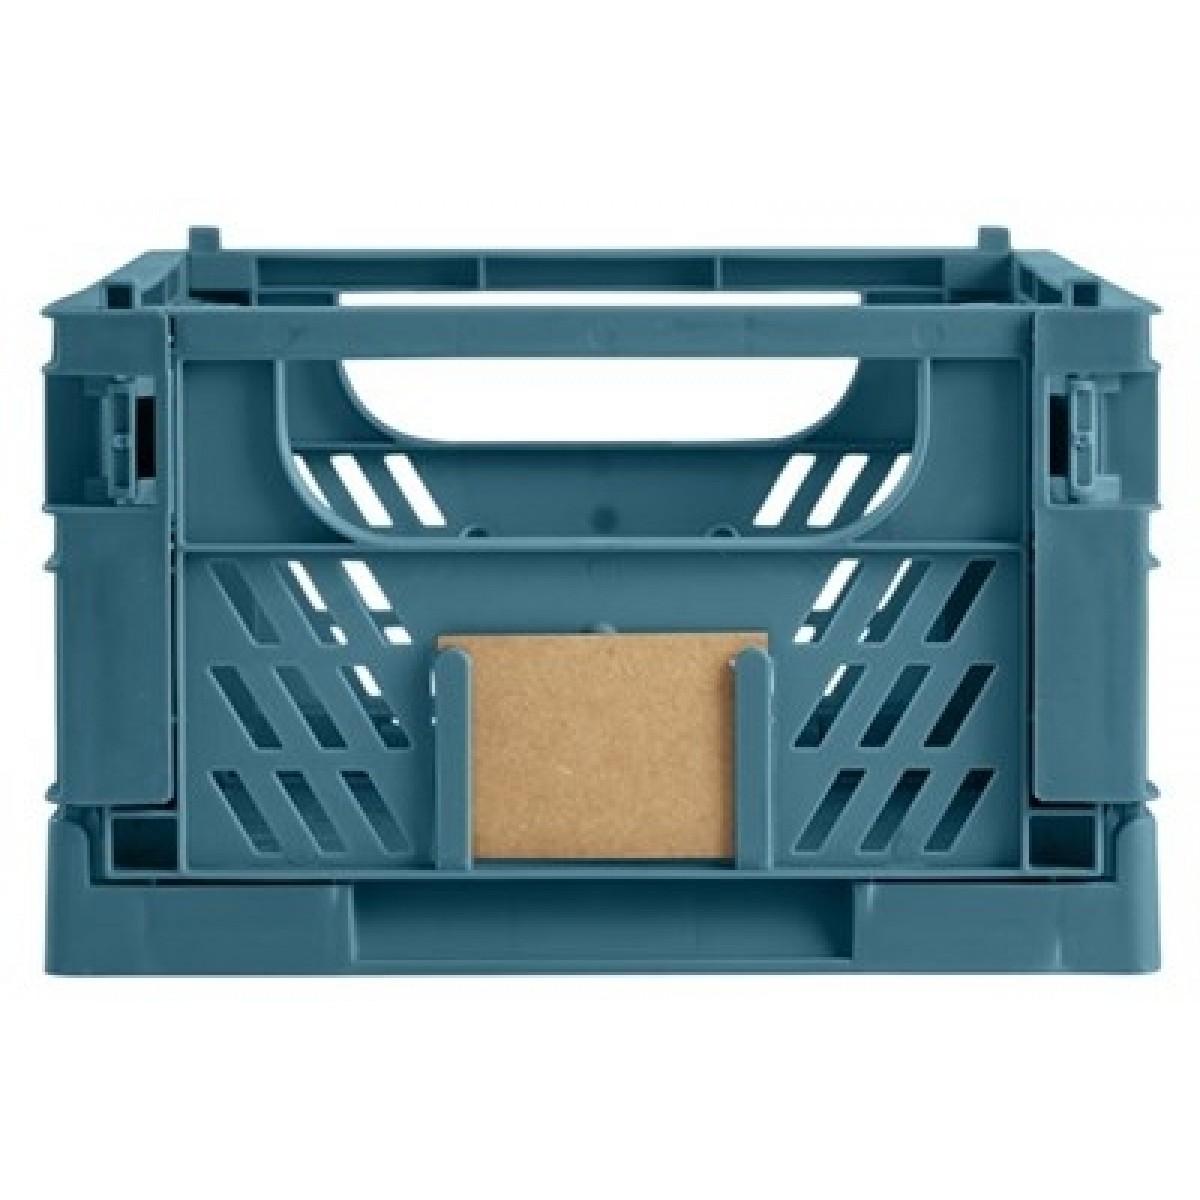 DAY Opbevaringskasse foldbar 33x24,5x15 cm tapestry blue